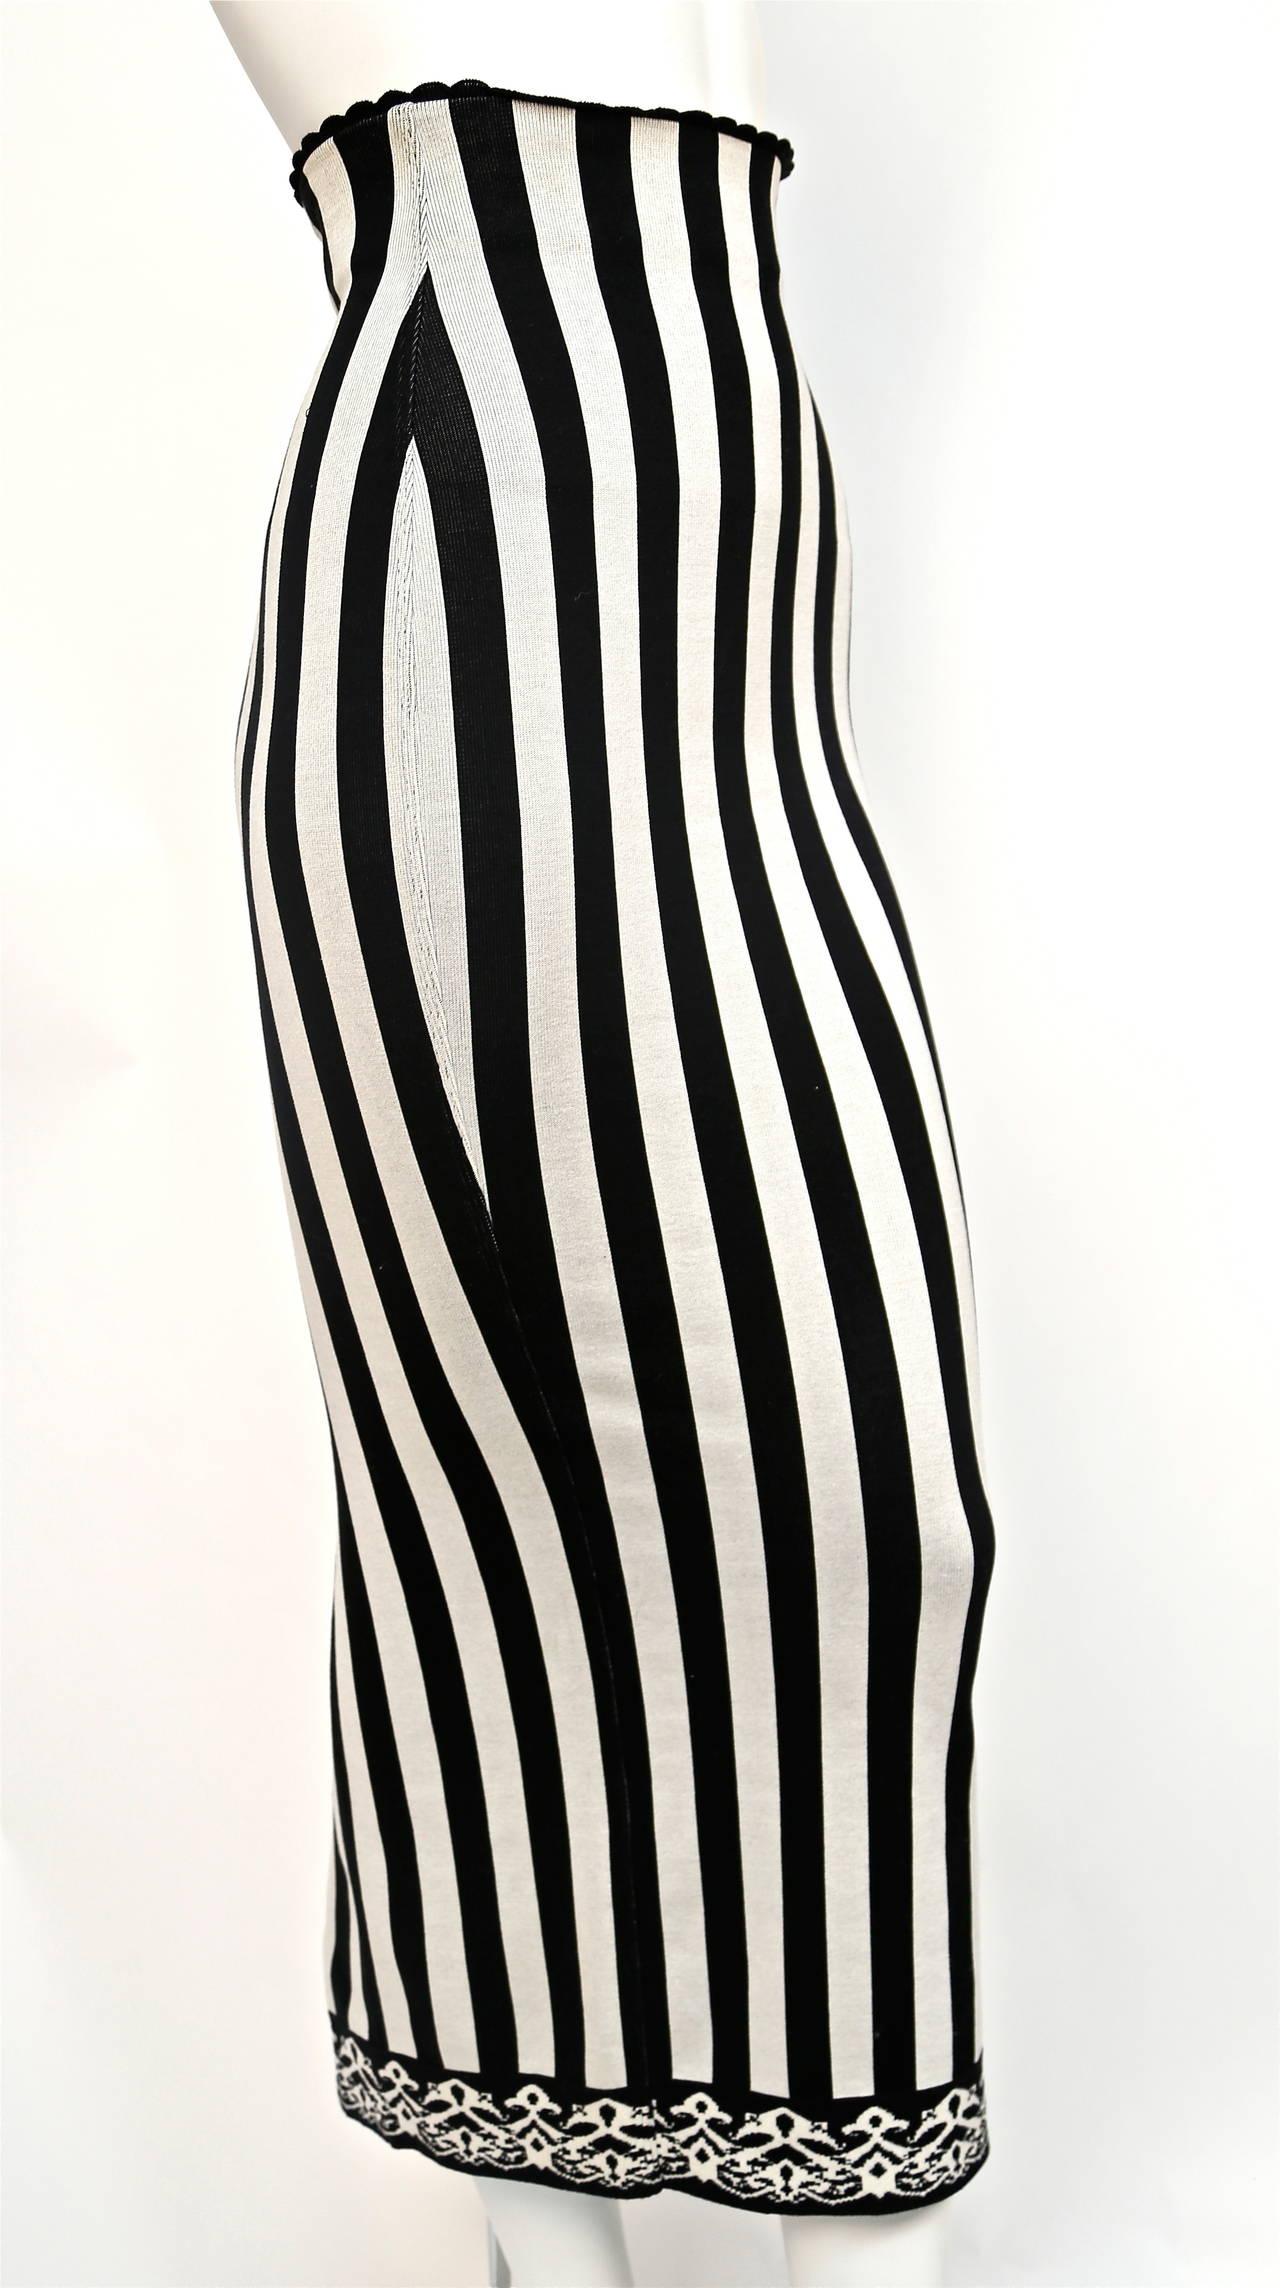 1992 AZZEDINE ALAIA black and white striped skirt 3